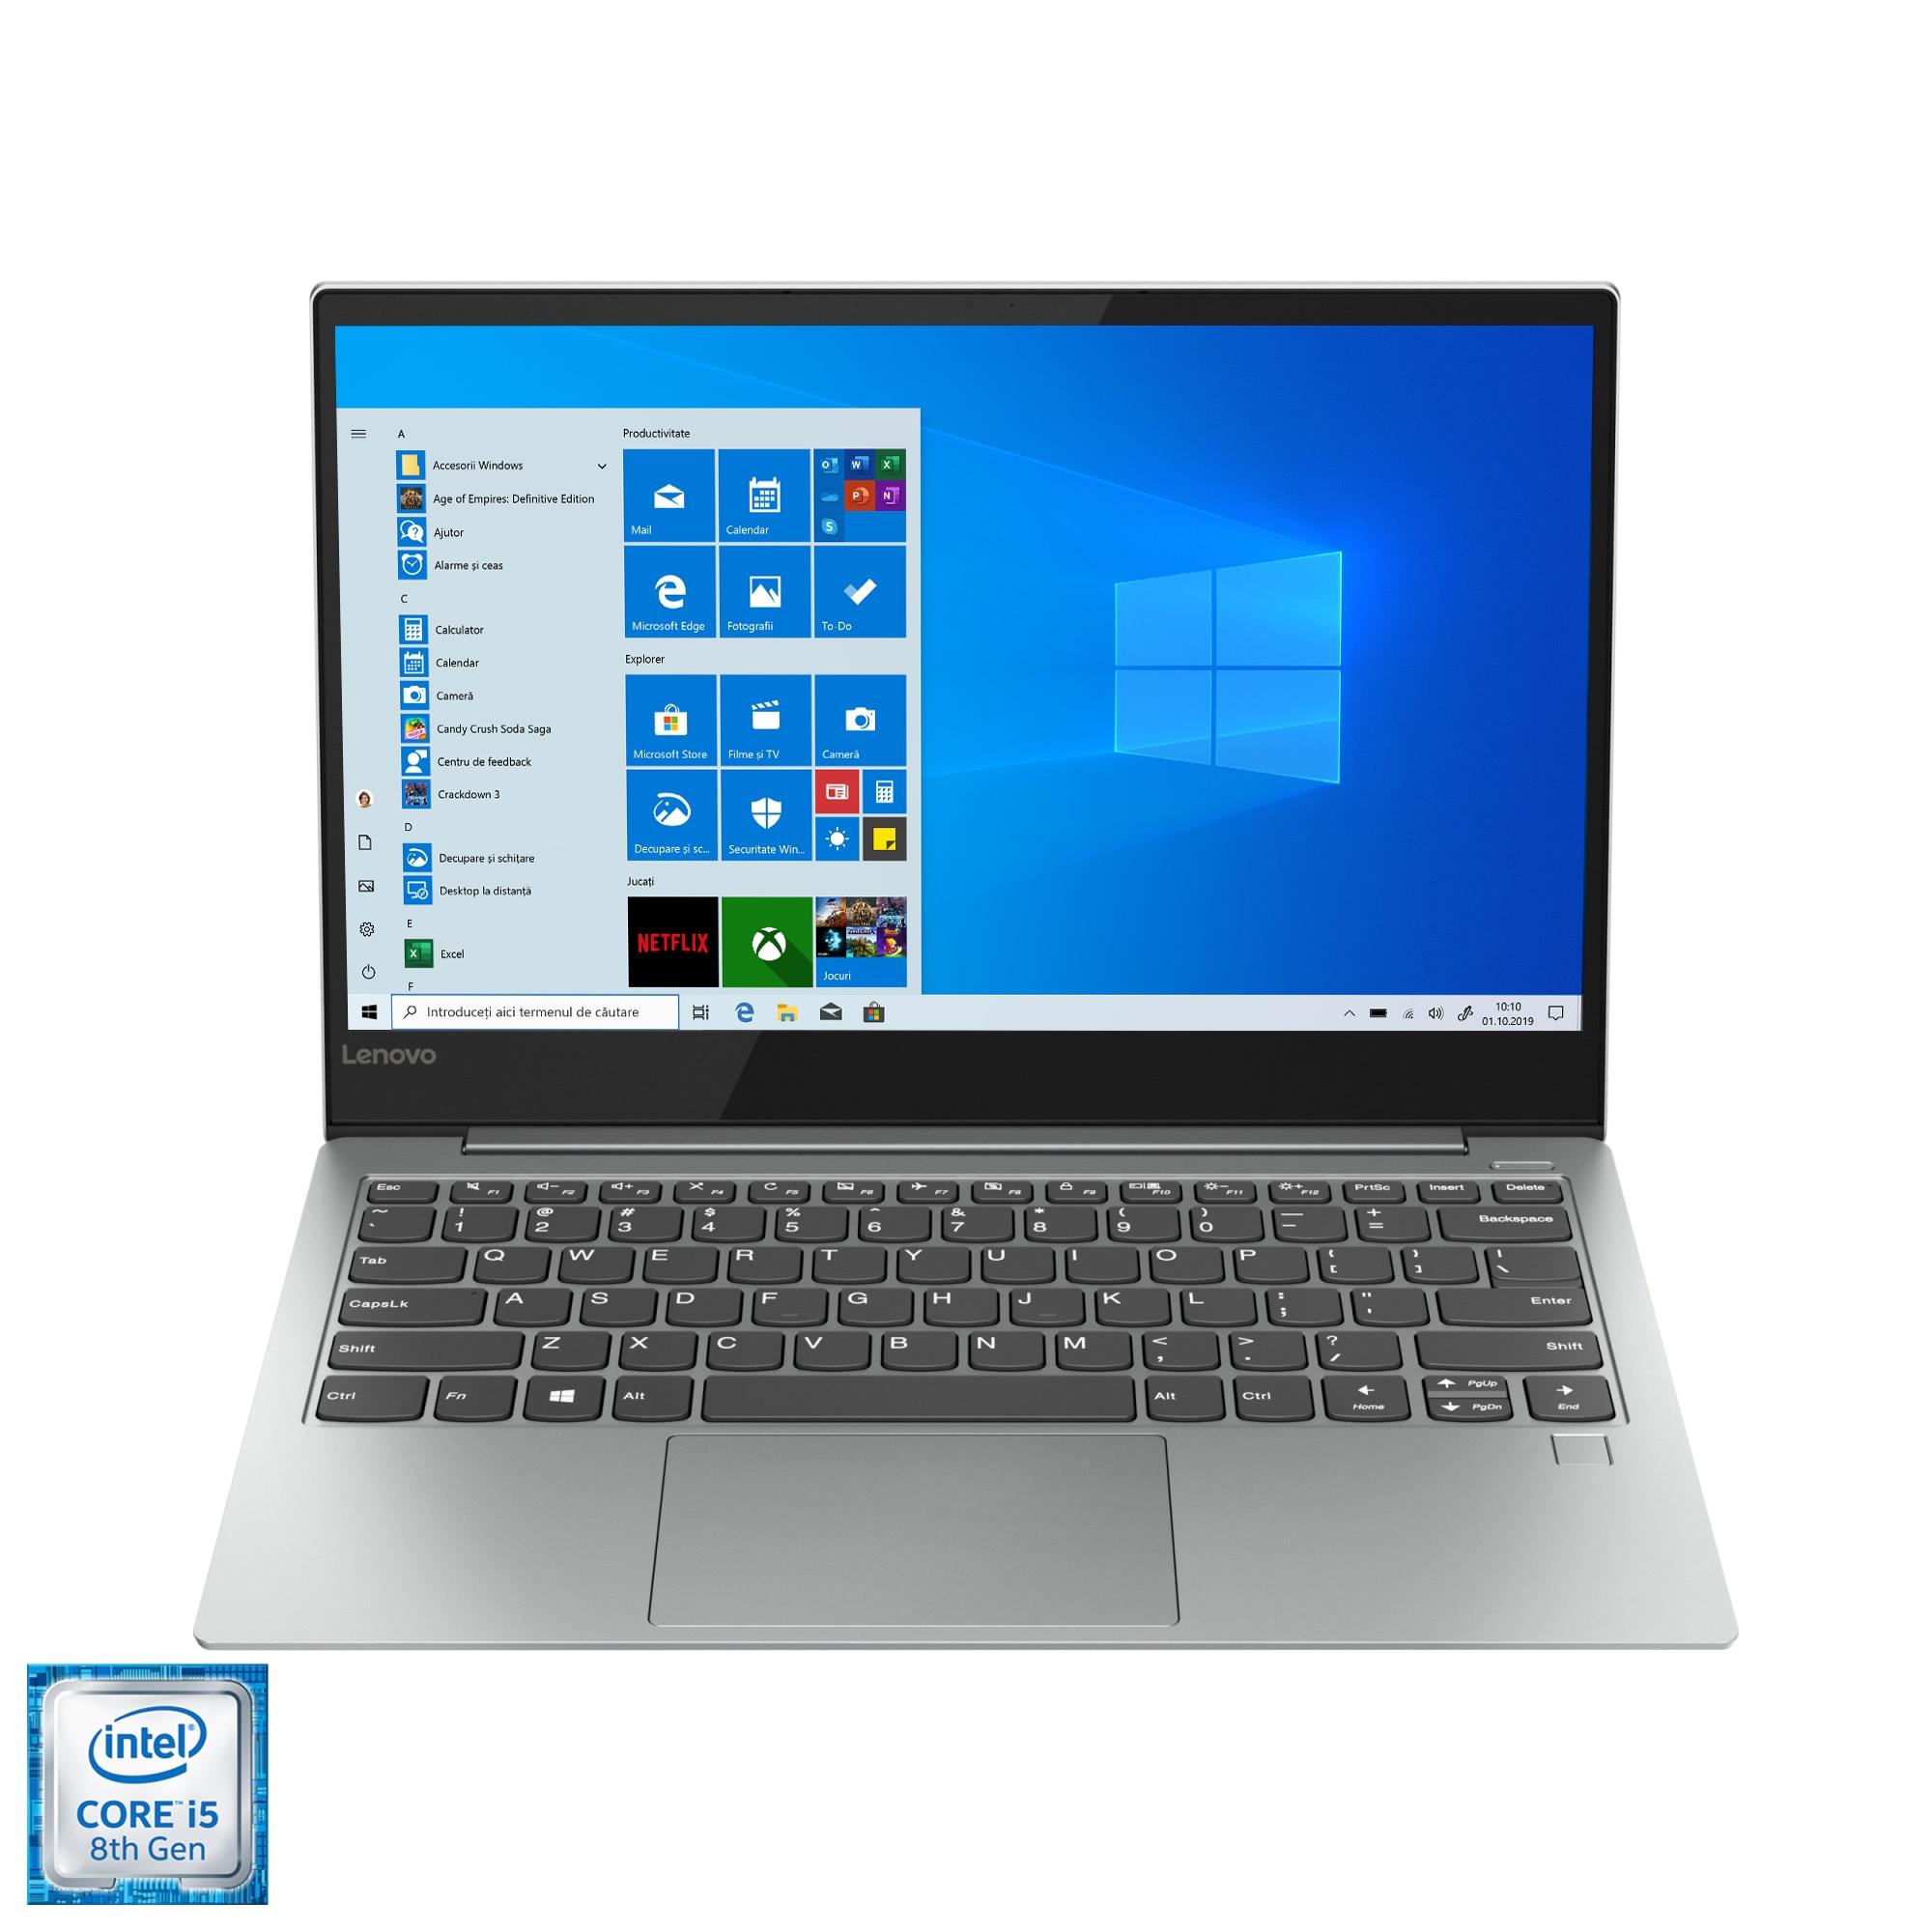 "Fotografie Laptop ultraportabil Lenovo YOGA S730-13IWL cu procesor Intel® Core™ i5-8265U pana la 3.90 GHz, Whiskey Lake, 13.3"", Full HD, IPS, 16GB, 512GB SSD, Intel® UHD Graphics 620, Microsoft Windows 10, Platinum"